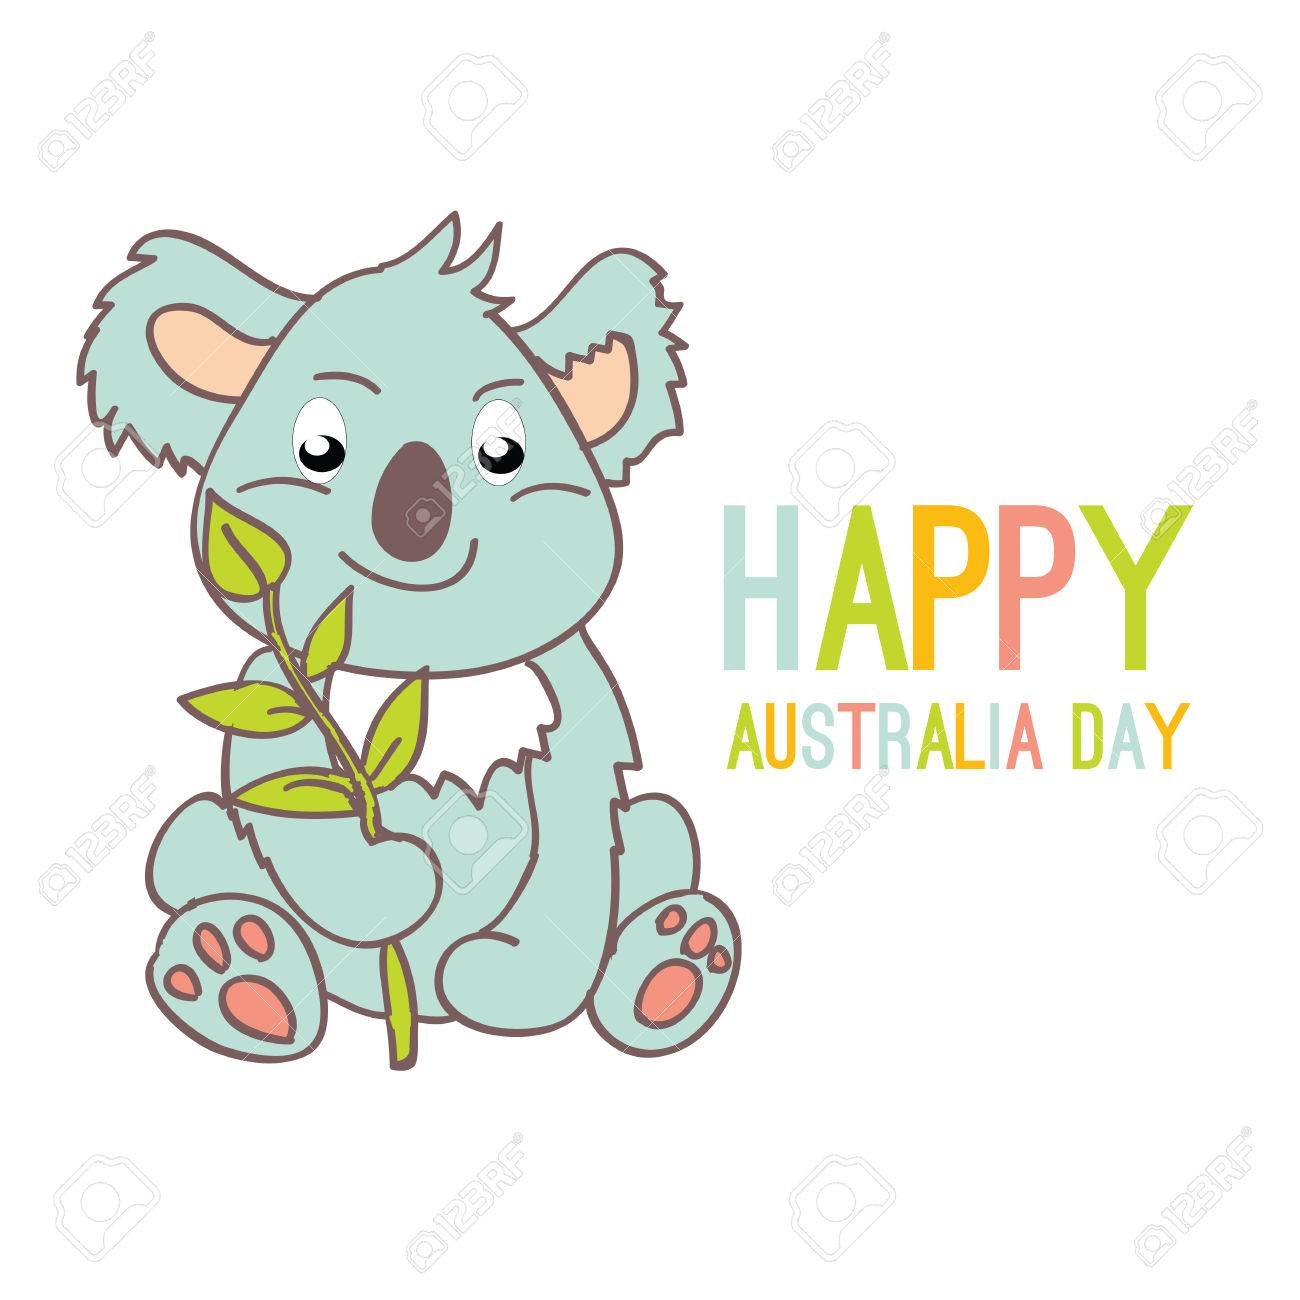 happy australia day with a cartoon koala celebratory background